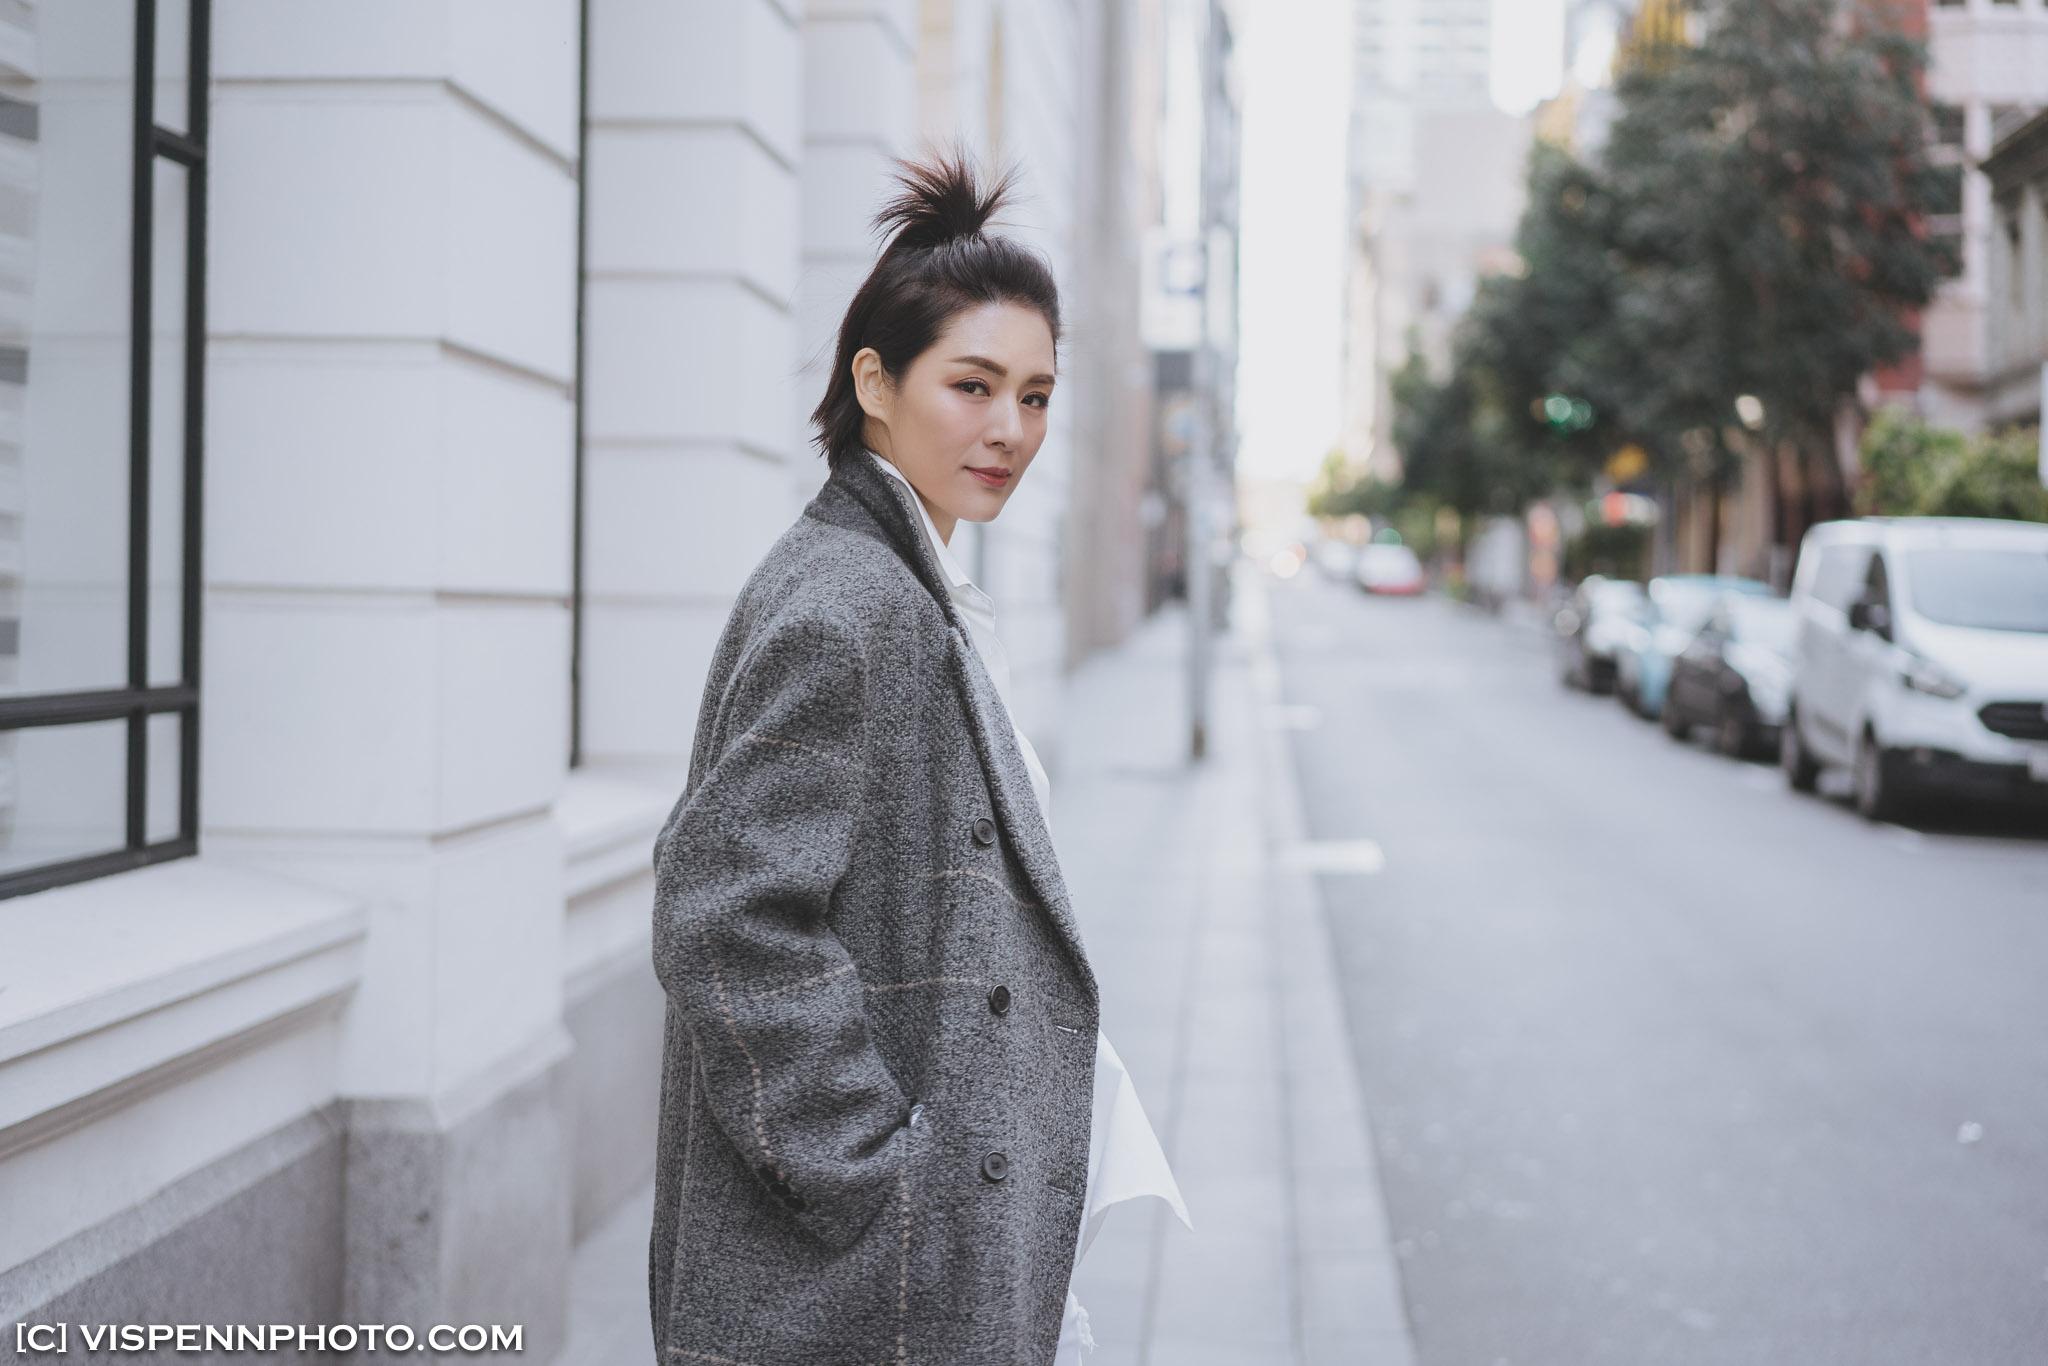 Melbourne Fashion Portrait Commercial Photography VISPENN 墨尔本 服装 商业 人像 摄影 MFW2A 3H 04181 A7R3 VISPENN